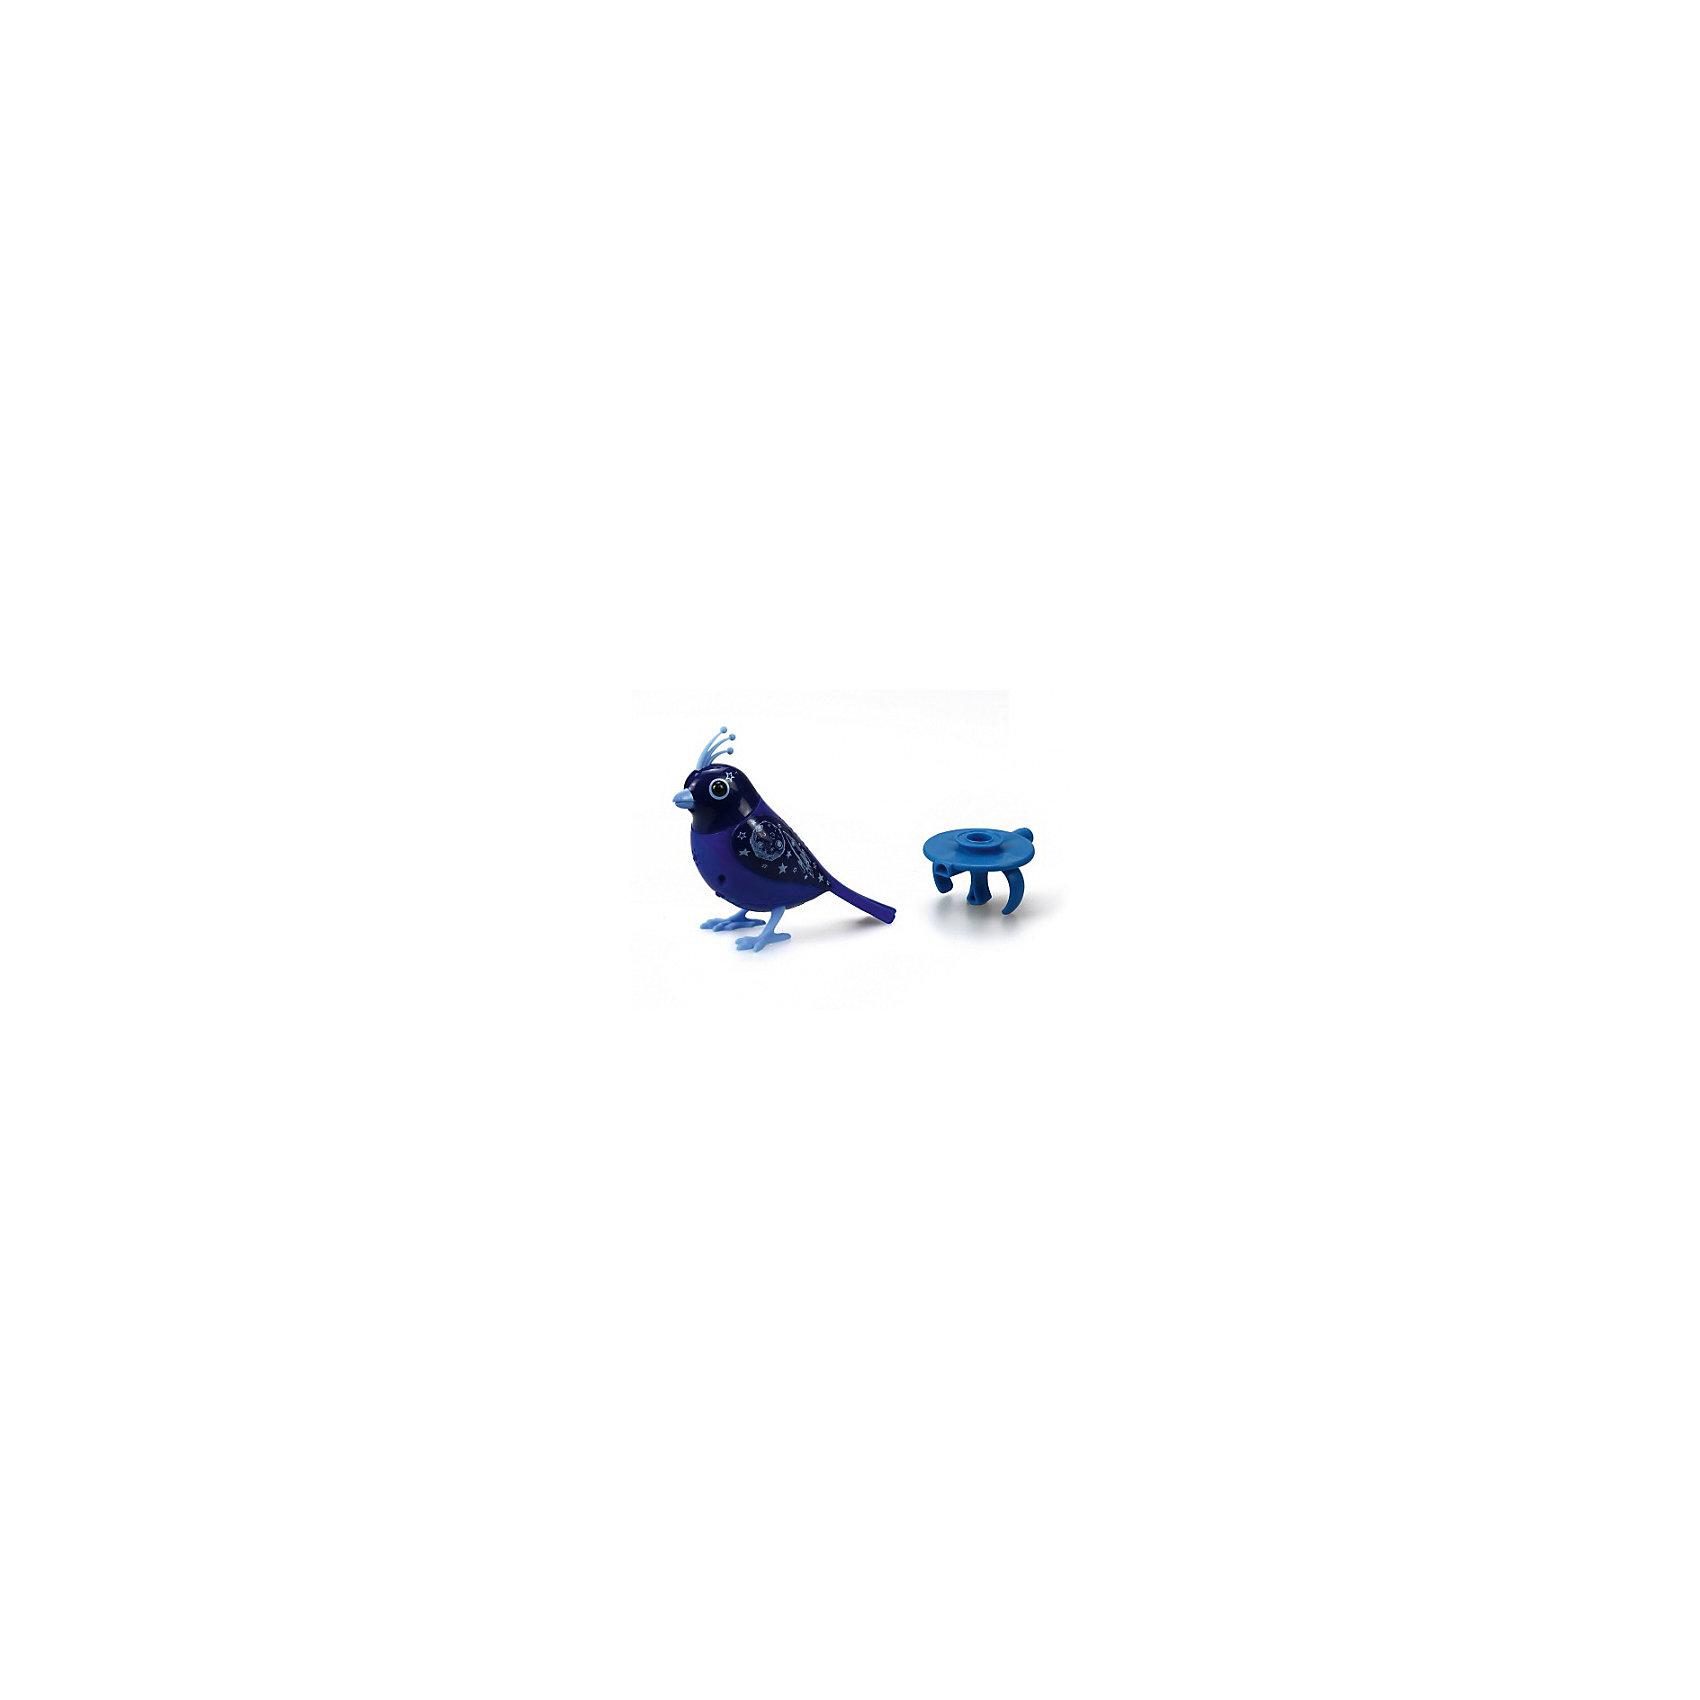 Silverlit Поющая птичка с кольцом, синяя, DigiBirds silverlit золотая птичка с кольцом